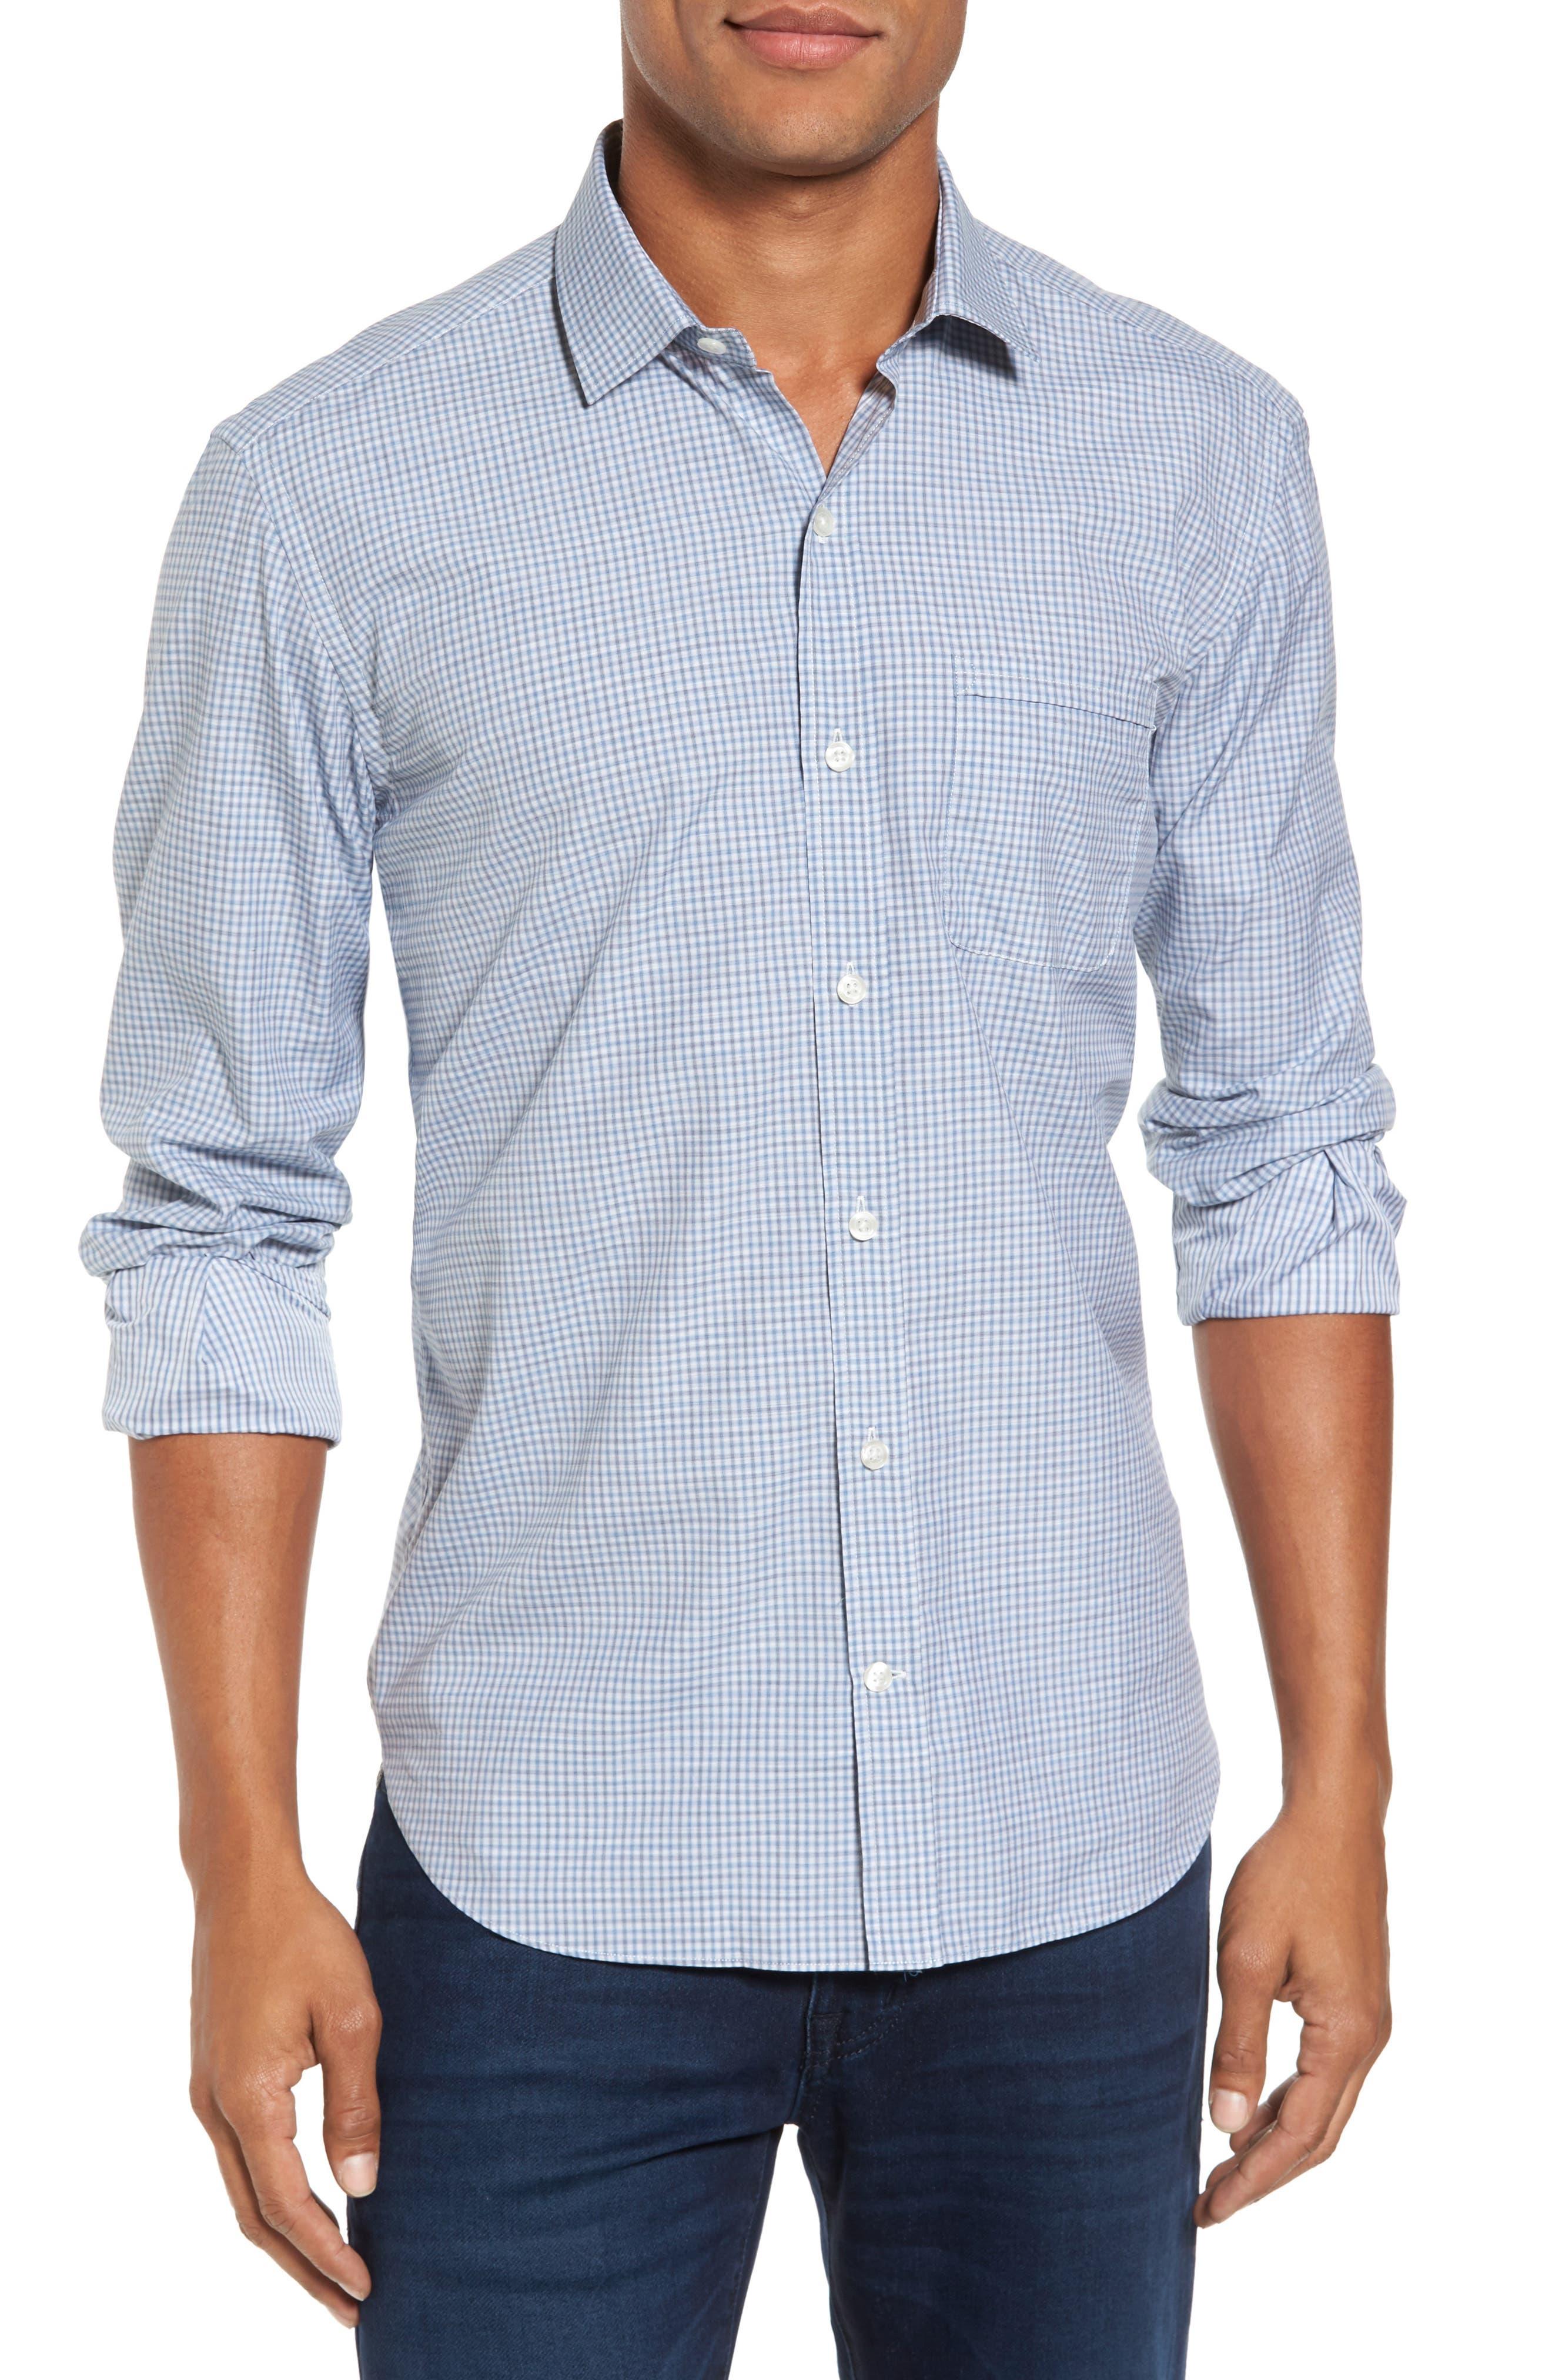 Culturata Slim Fit Plaid Sport Shirt